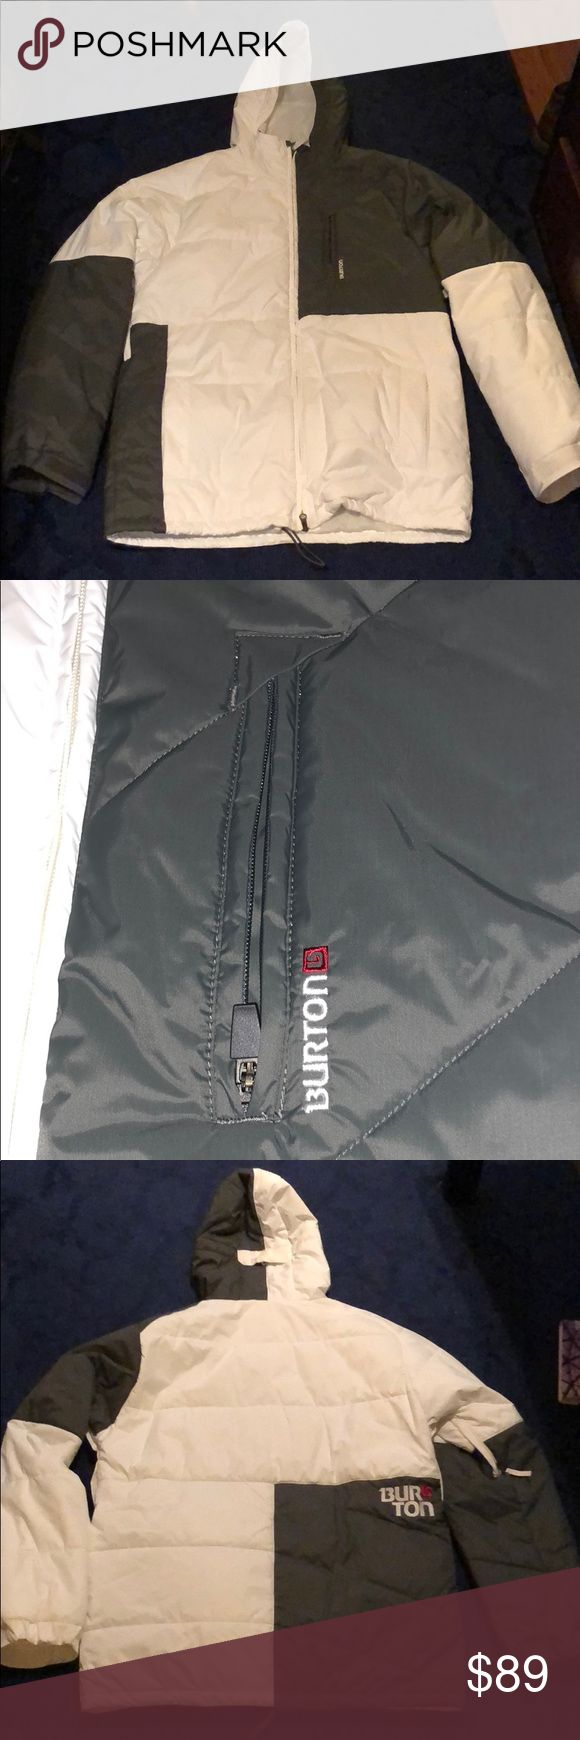 Burton Ski Jacket in Like New condition! White/Grey burton ski jacket worn once! Burton Jackets & Coats Ski & Snowboard #skiing